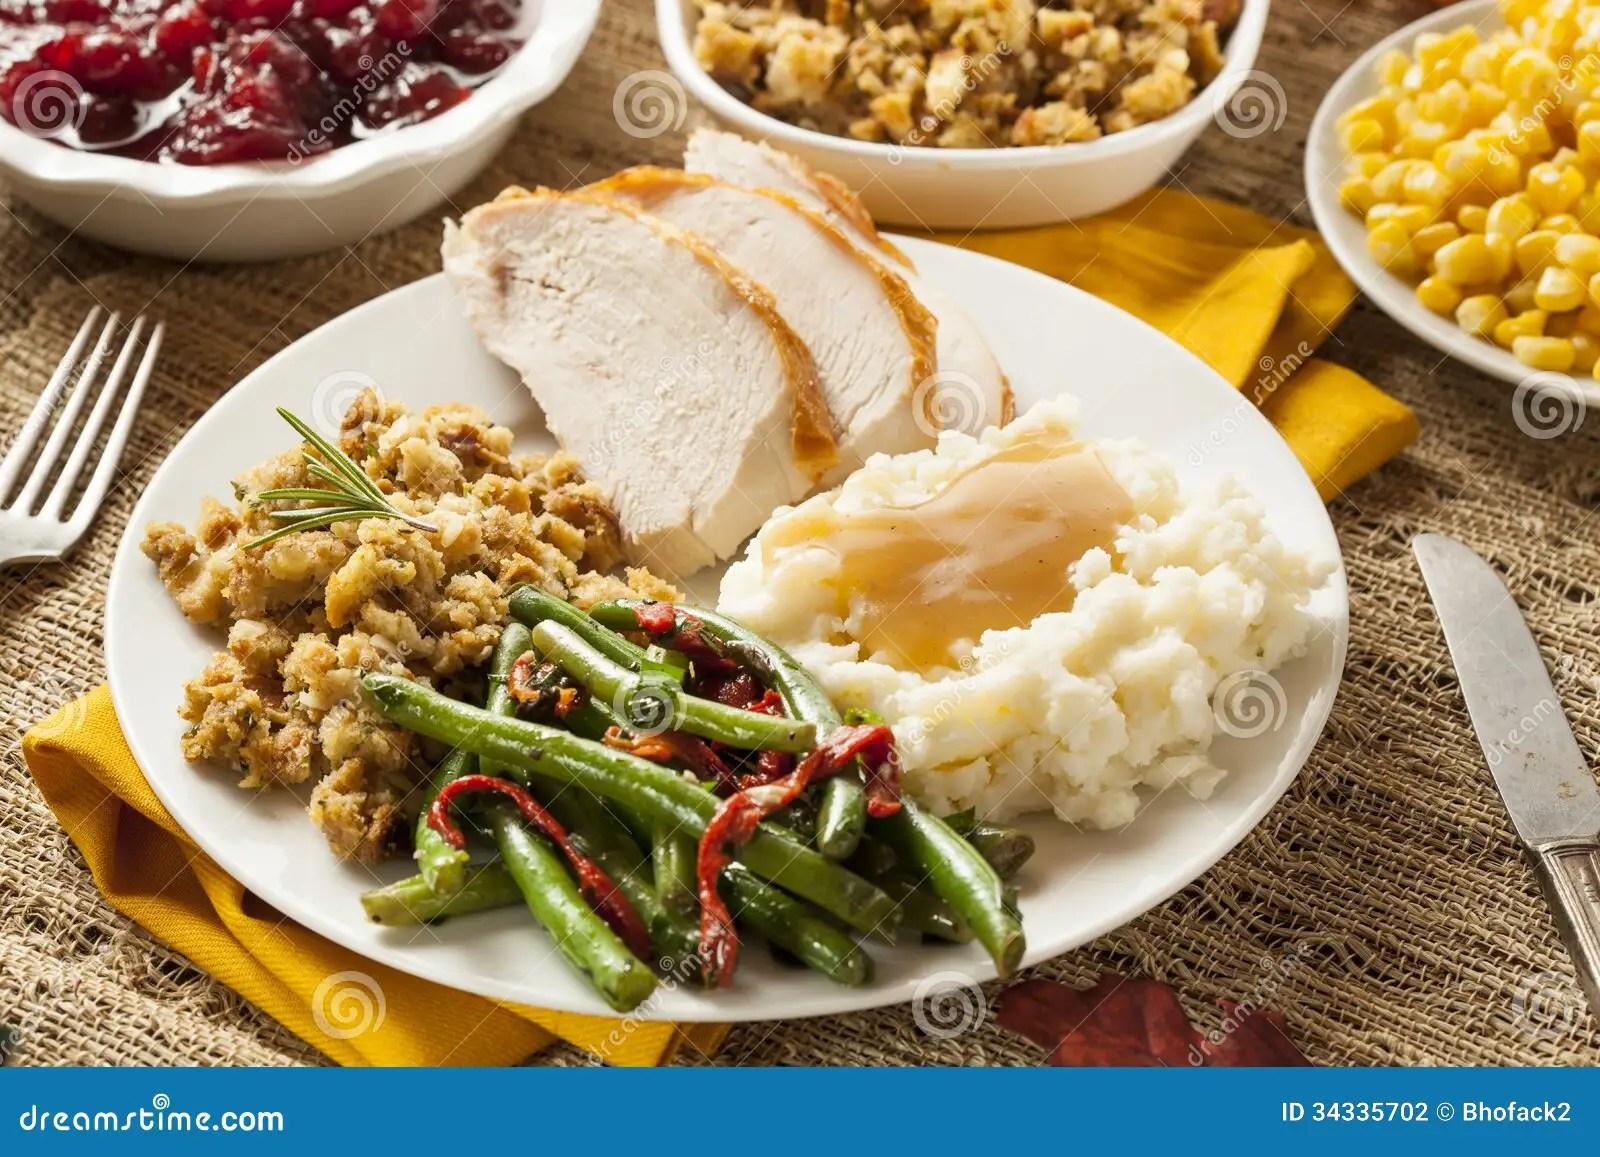 Thanksgiving Turkey Prices